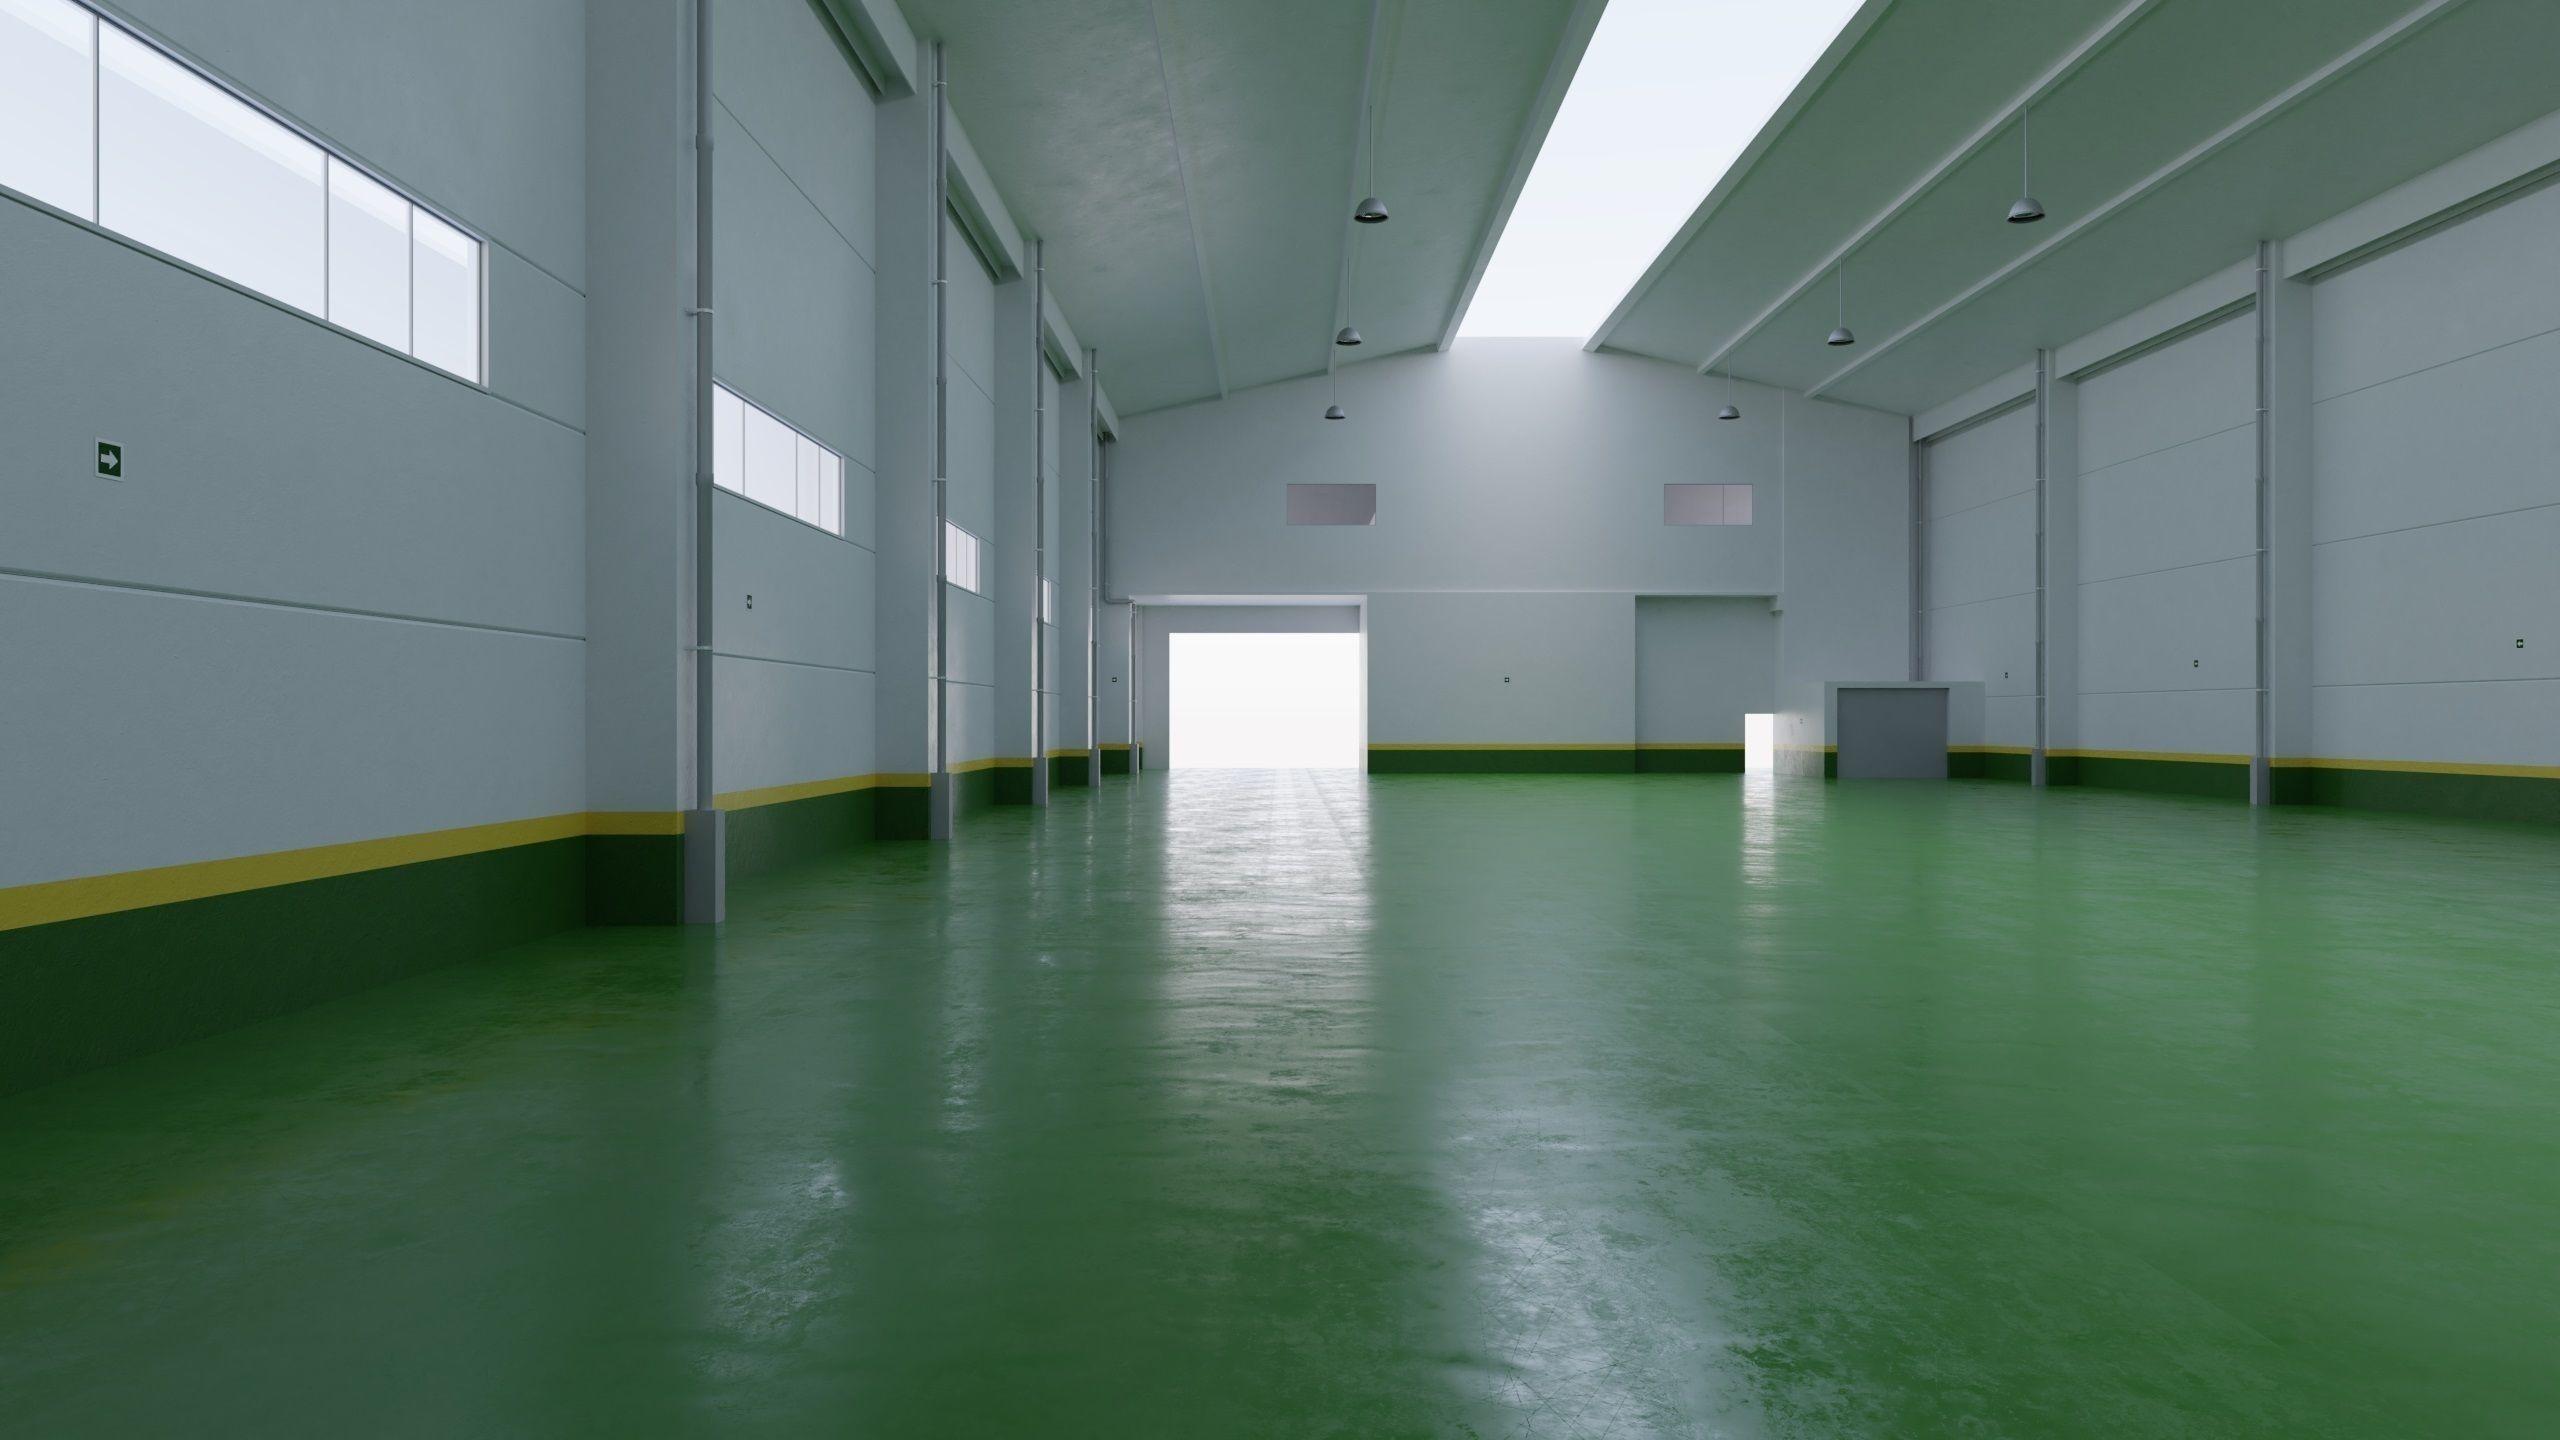 Factory Hall Interior 4